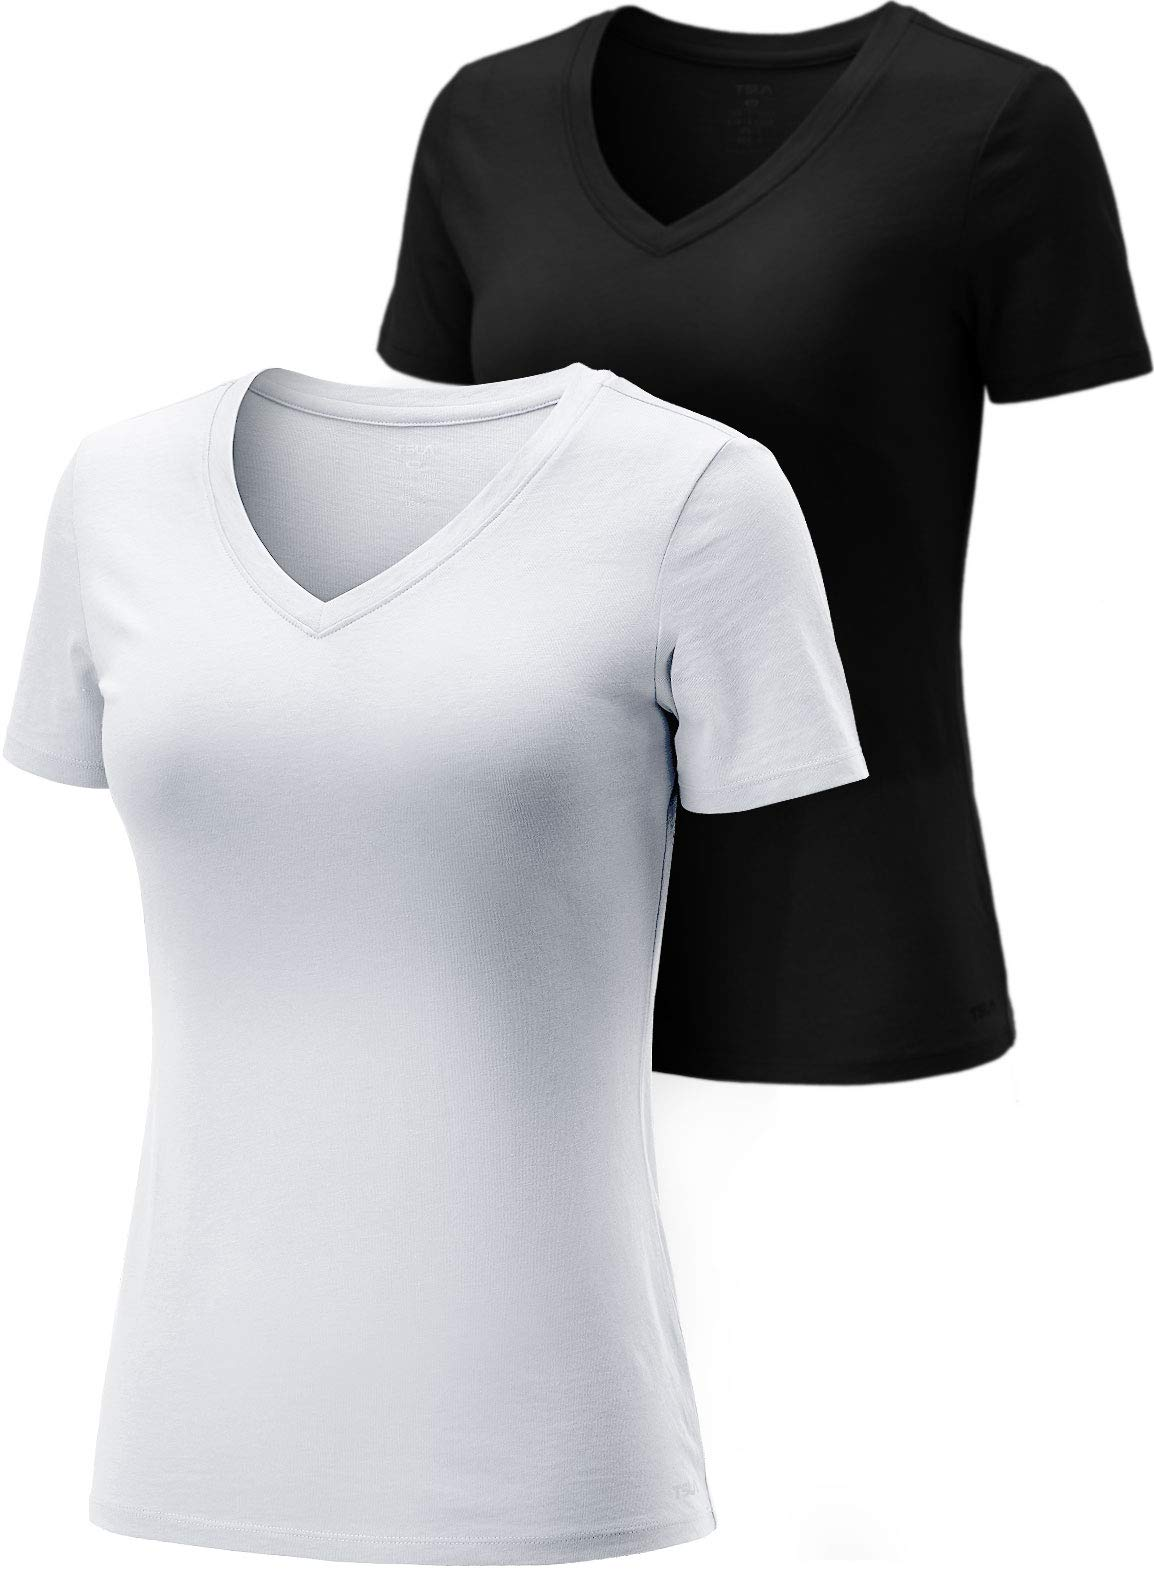 TSLA Women's Short Sleeve Workout Shirts, Dry Fit Moisture Wicking V-Neck T-Shirts, Sports Running Tee Shirt